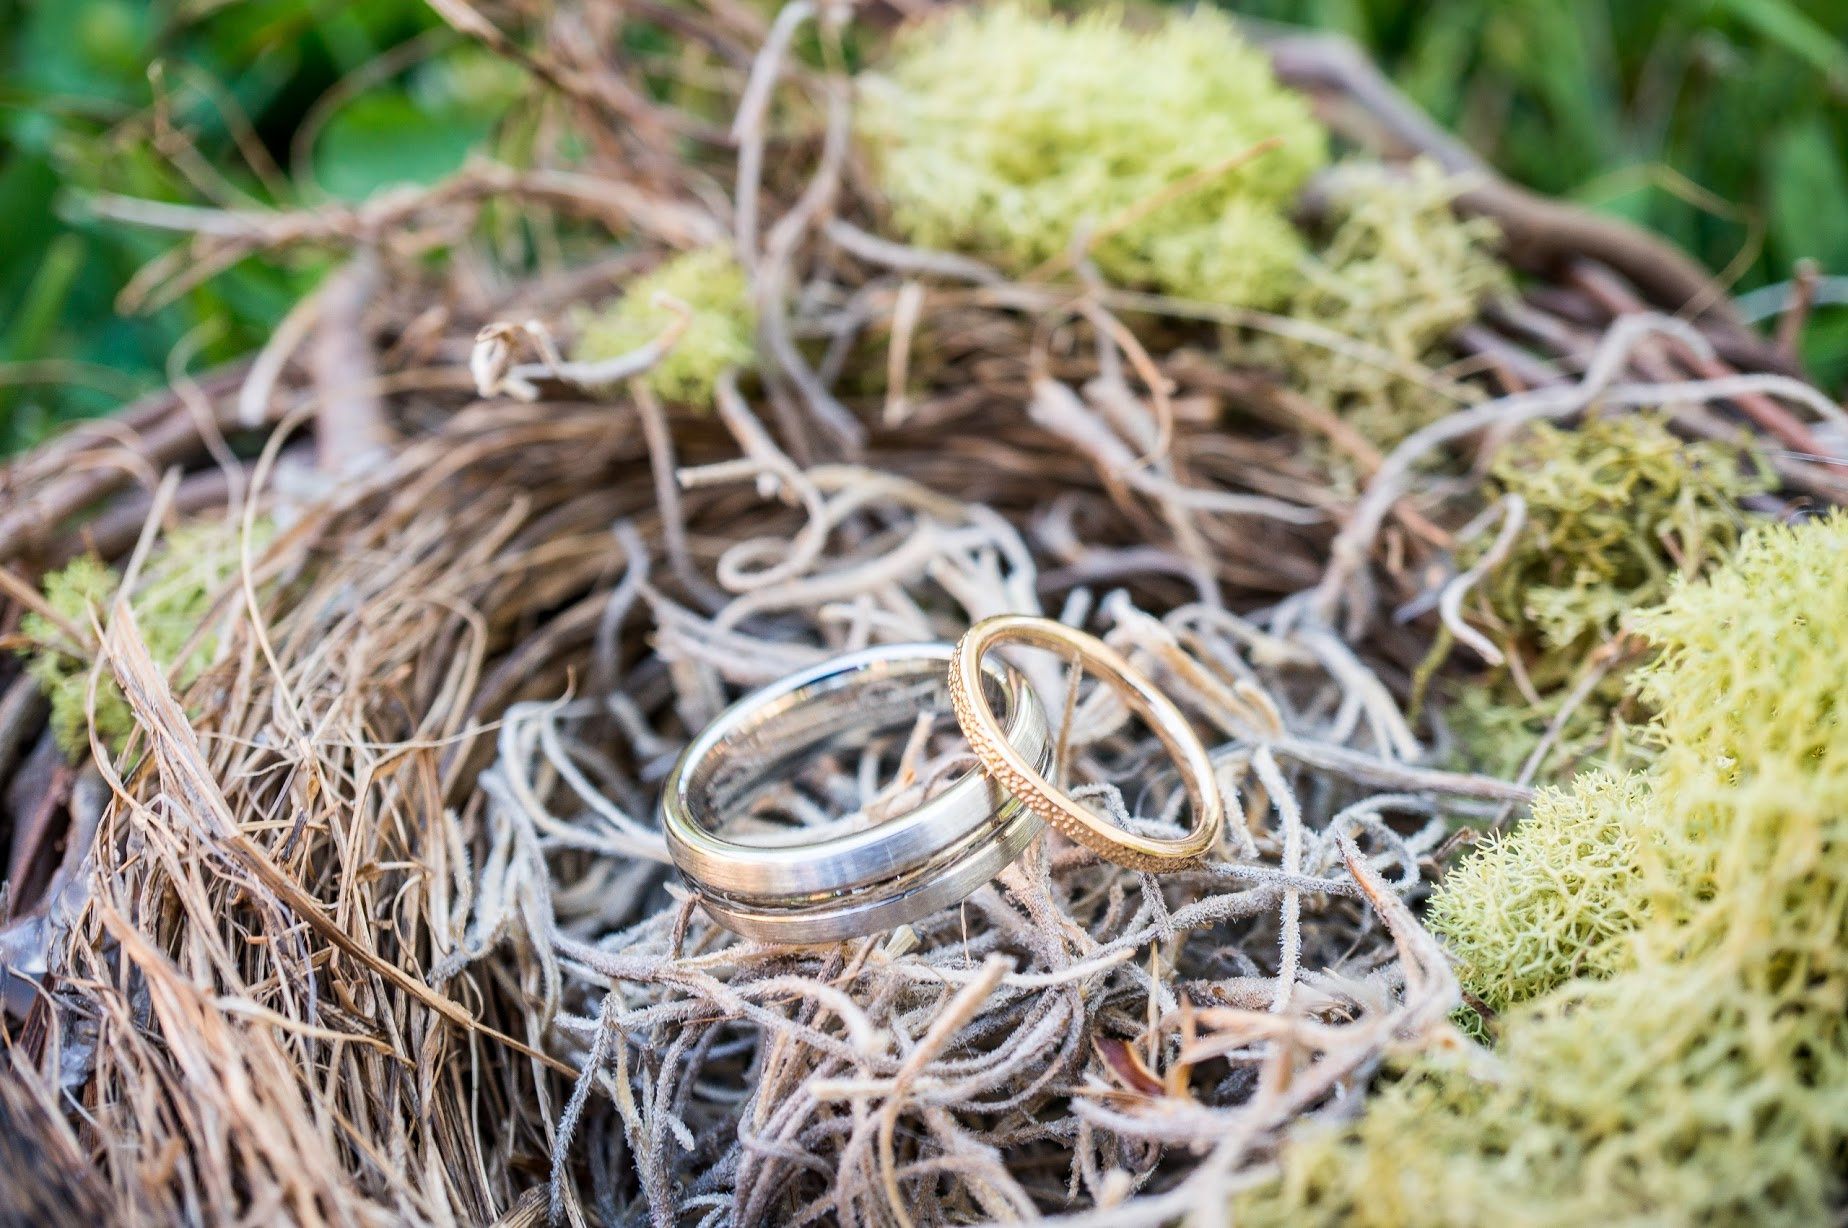 Wedding rings nestled in bird nest for photo | Meadowbrook Farm Wedding, Snoqualmie, WA | Perfectly Posh Events, Seattle Wedding Planner | Sasha Reiko Photography | Jesse + Wes Wedding // © Sasha Reiko Photography